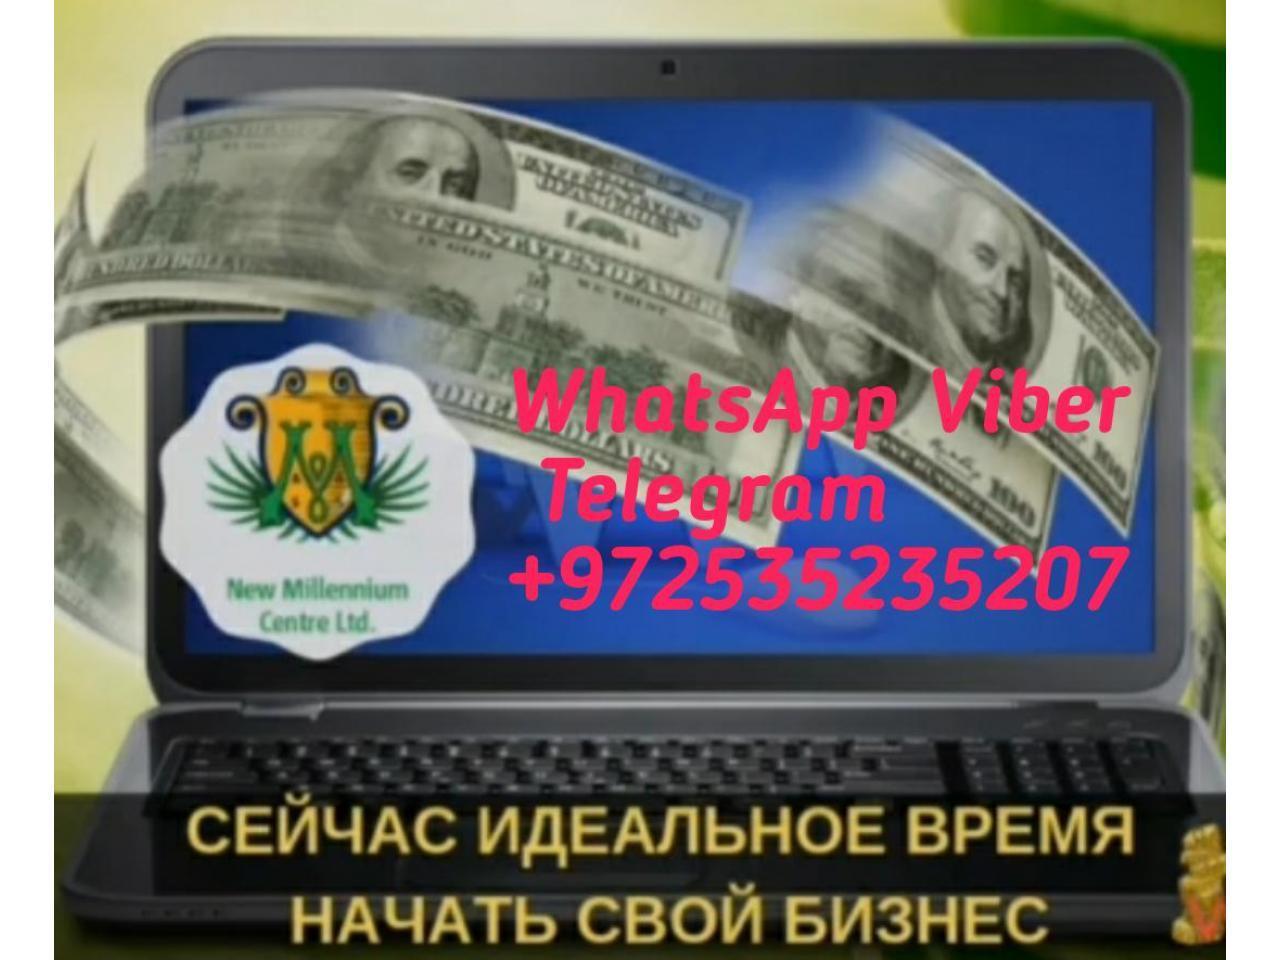 Онлайн БИЗНЕС - 1